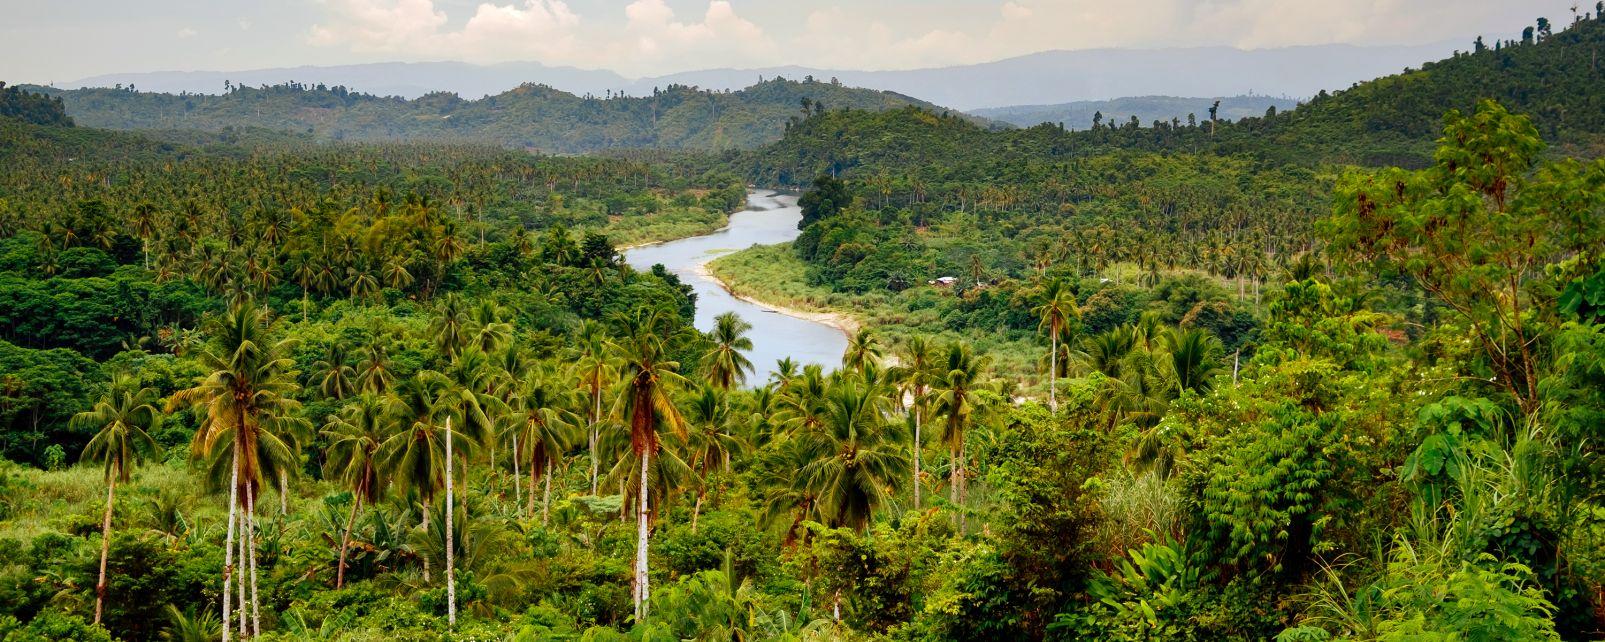 Les paysages, Philippines, mindanao, sud, asie